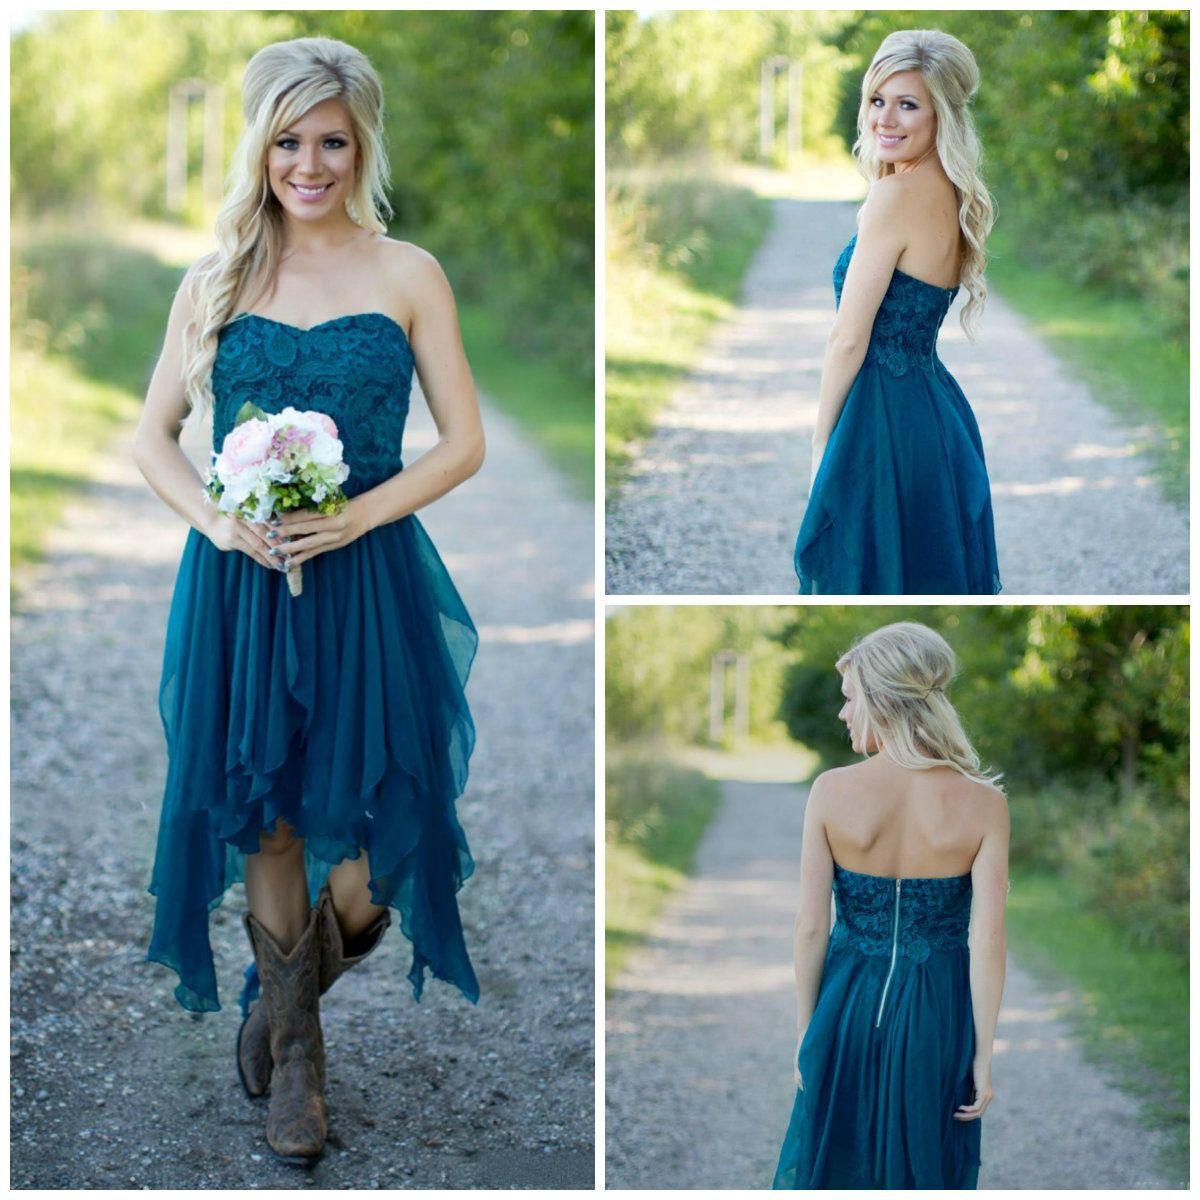 Summer Beach Short Bridesmaid Dresses Lace Applique Sweetheart Neck ...